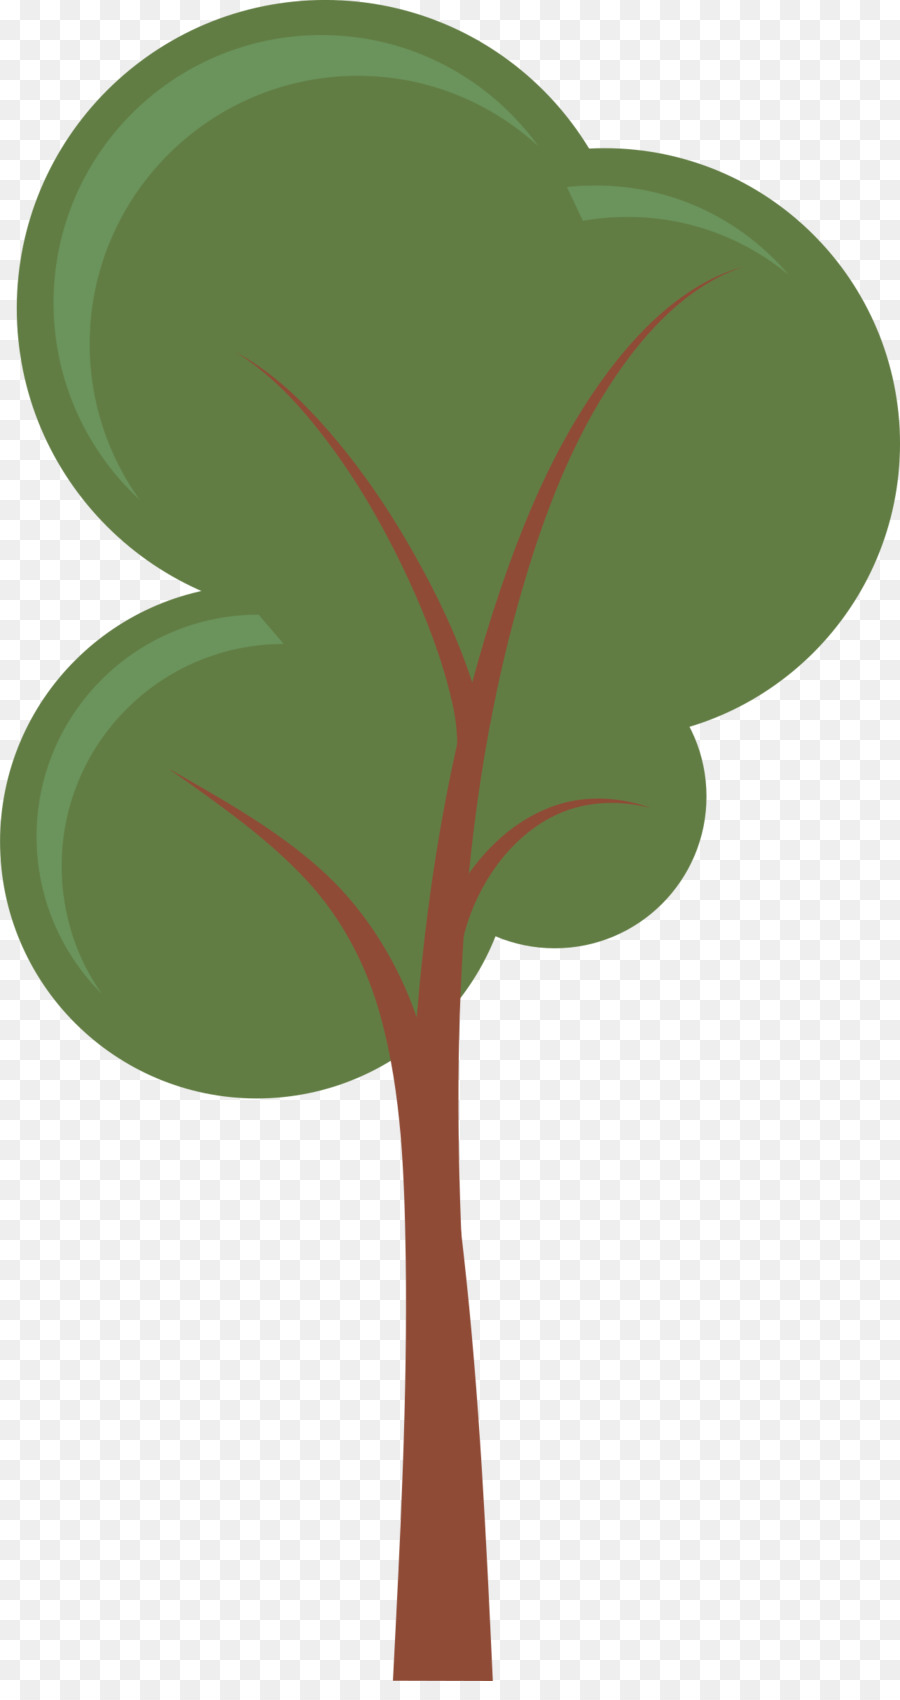 900x1700 Cartoon Tree Clip Art